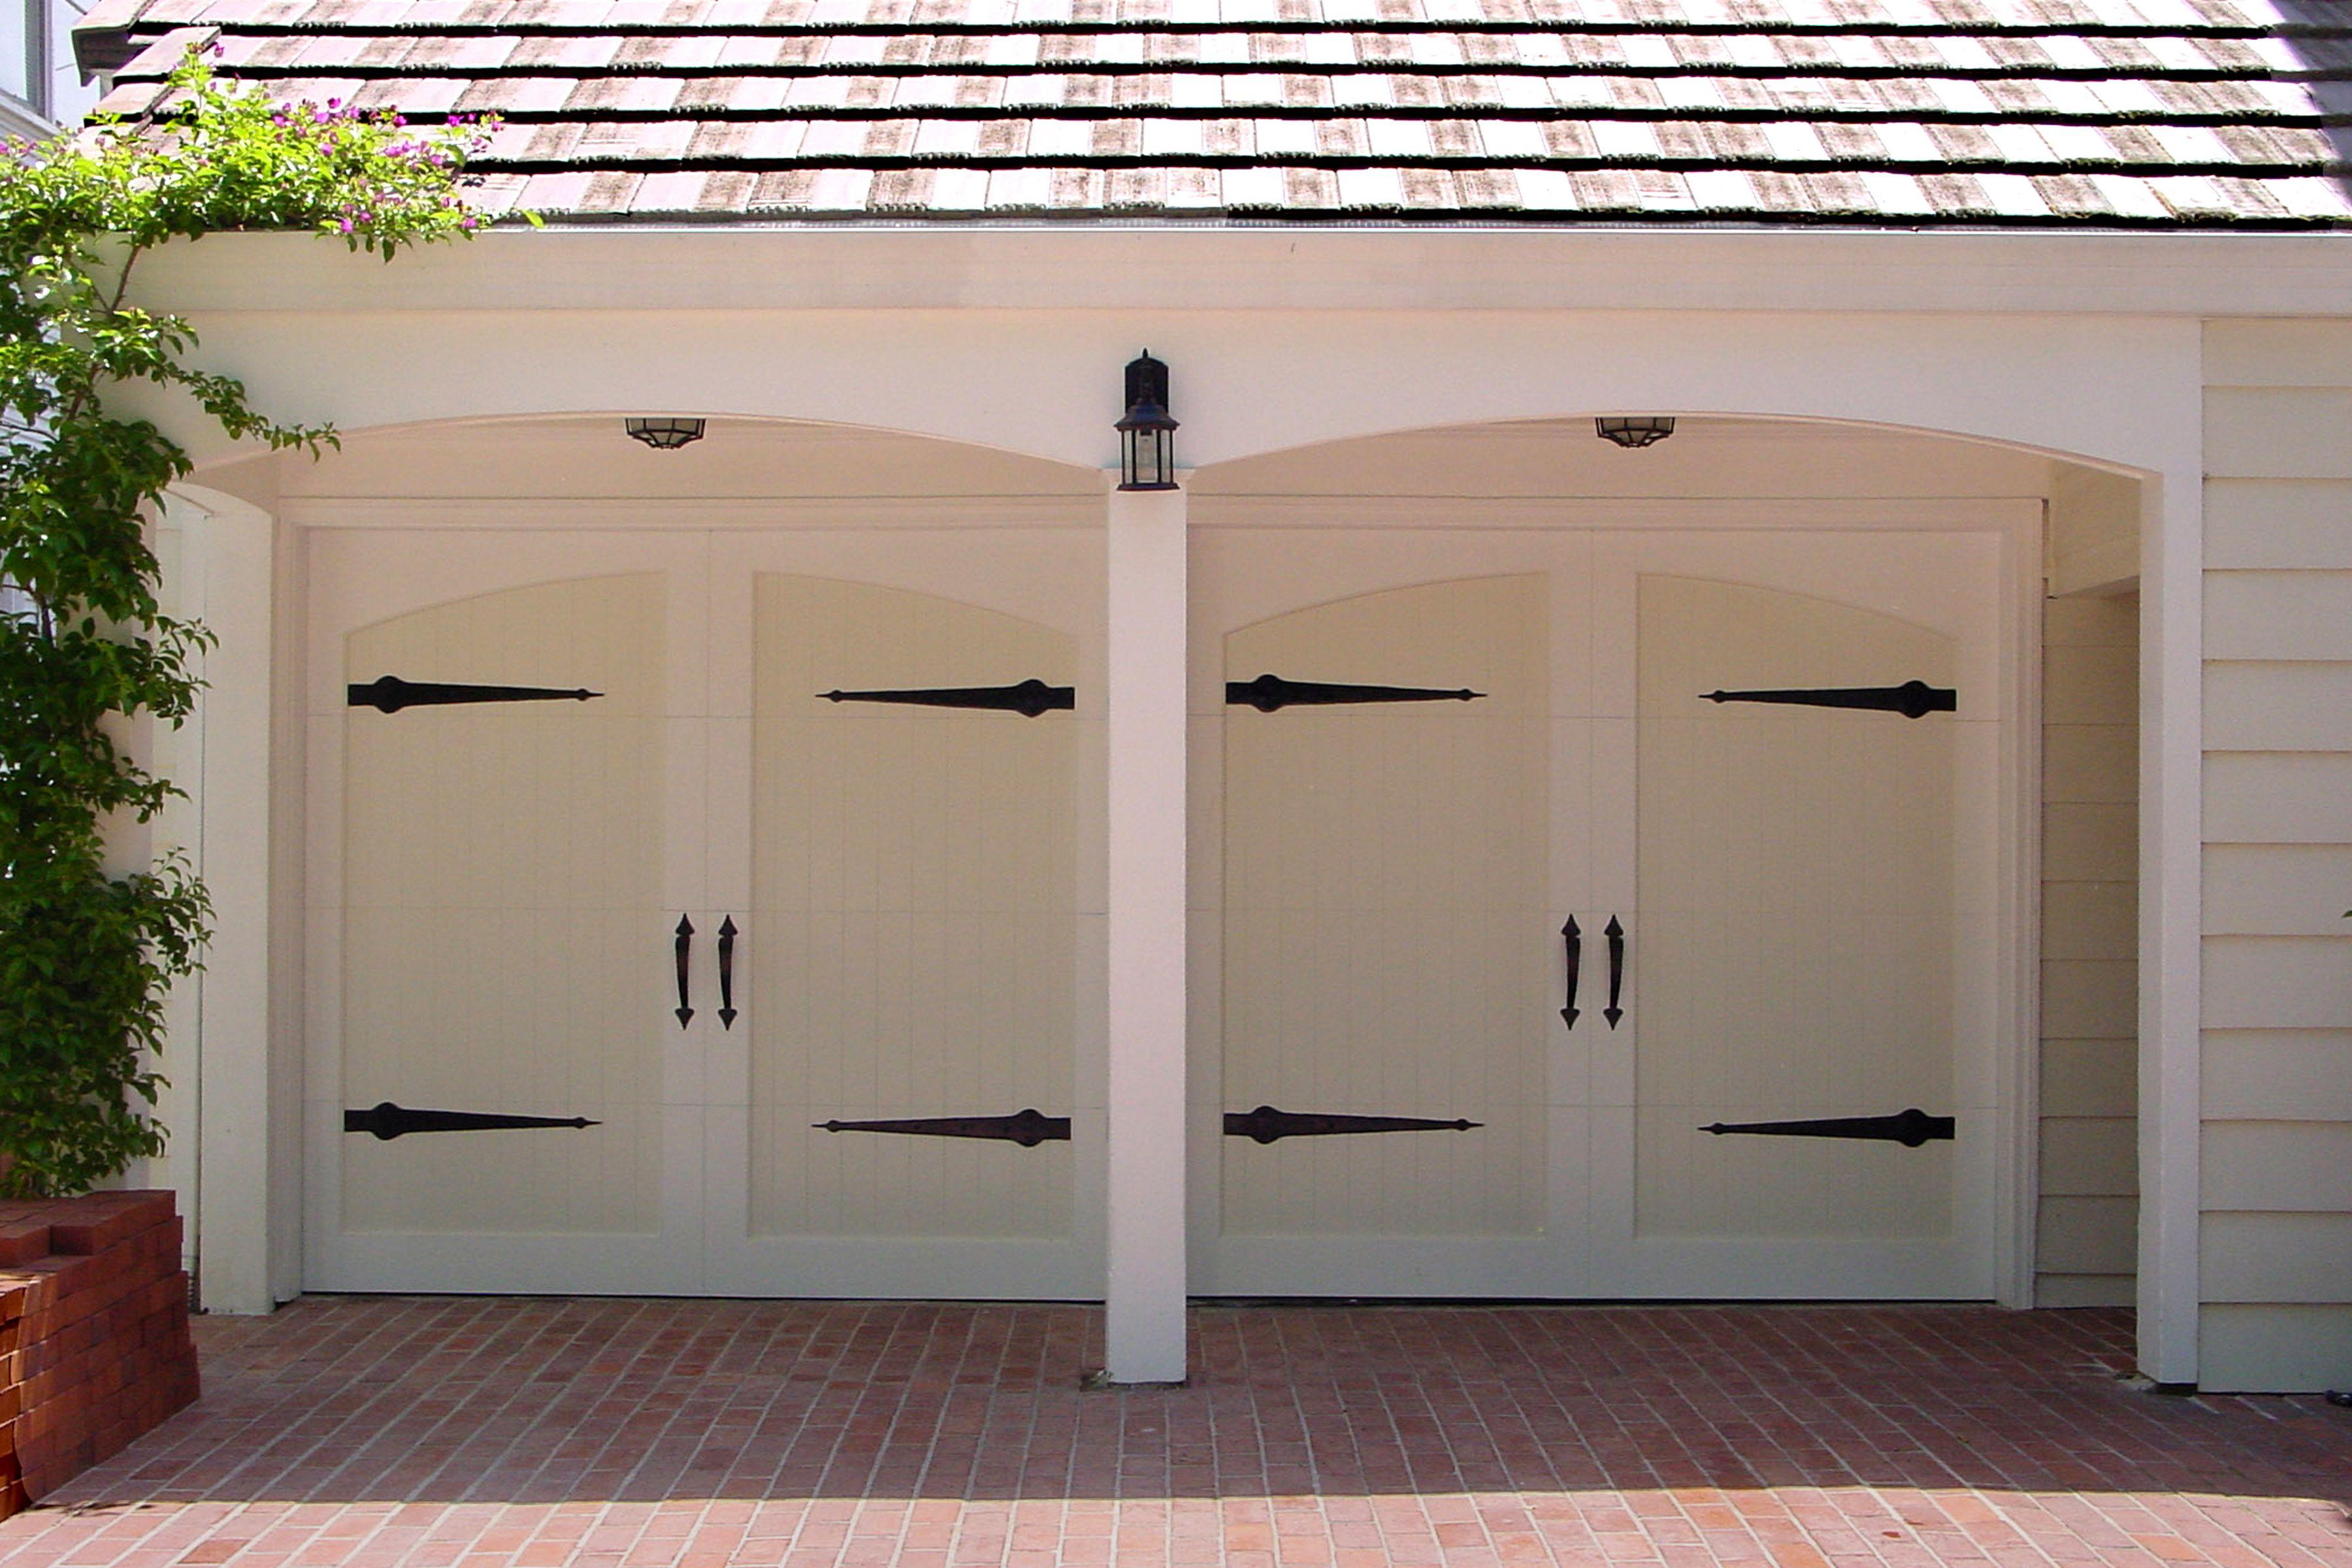 Paint Grade Carriage House Door Garage Carriage Style Doors Pin